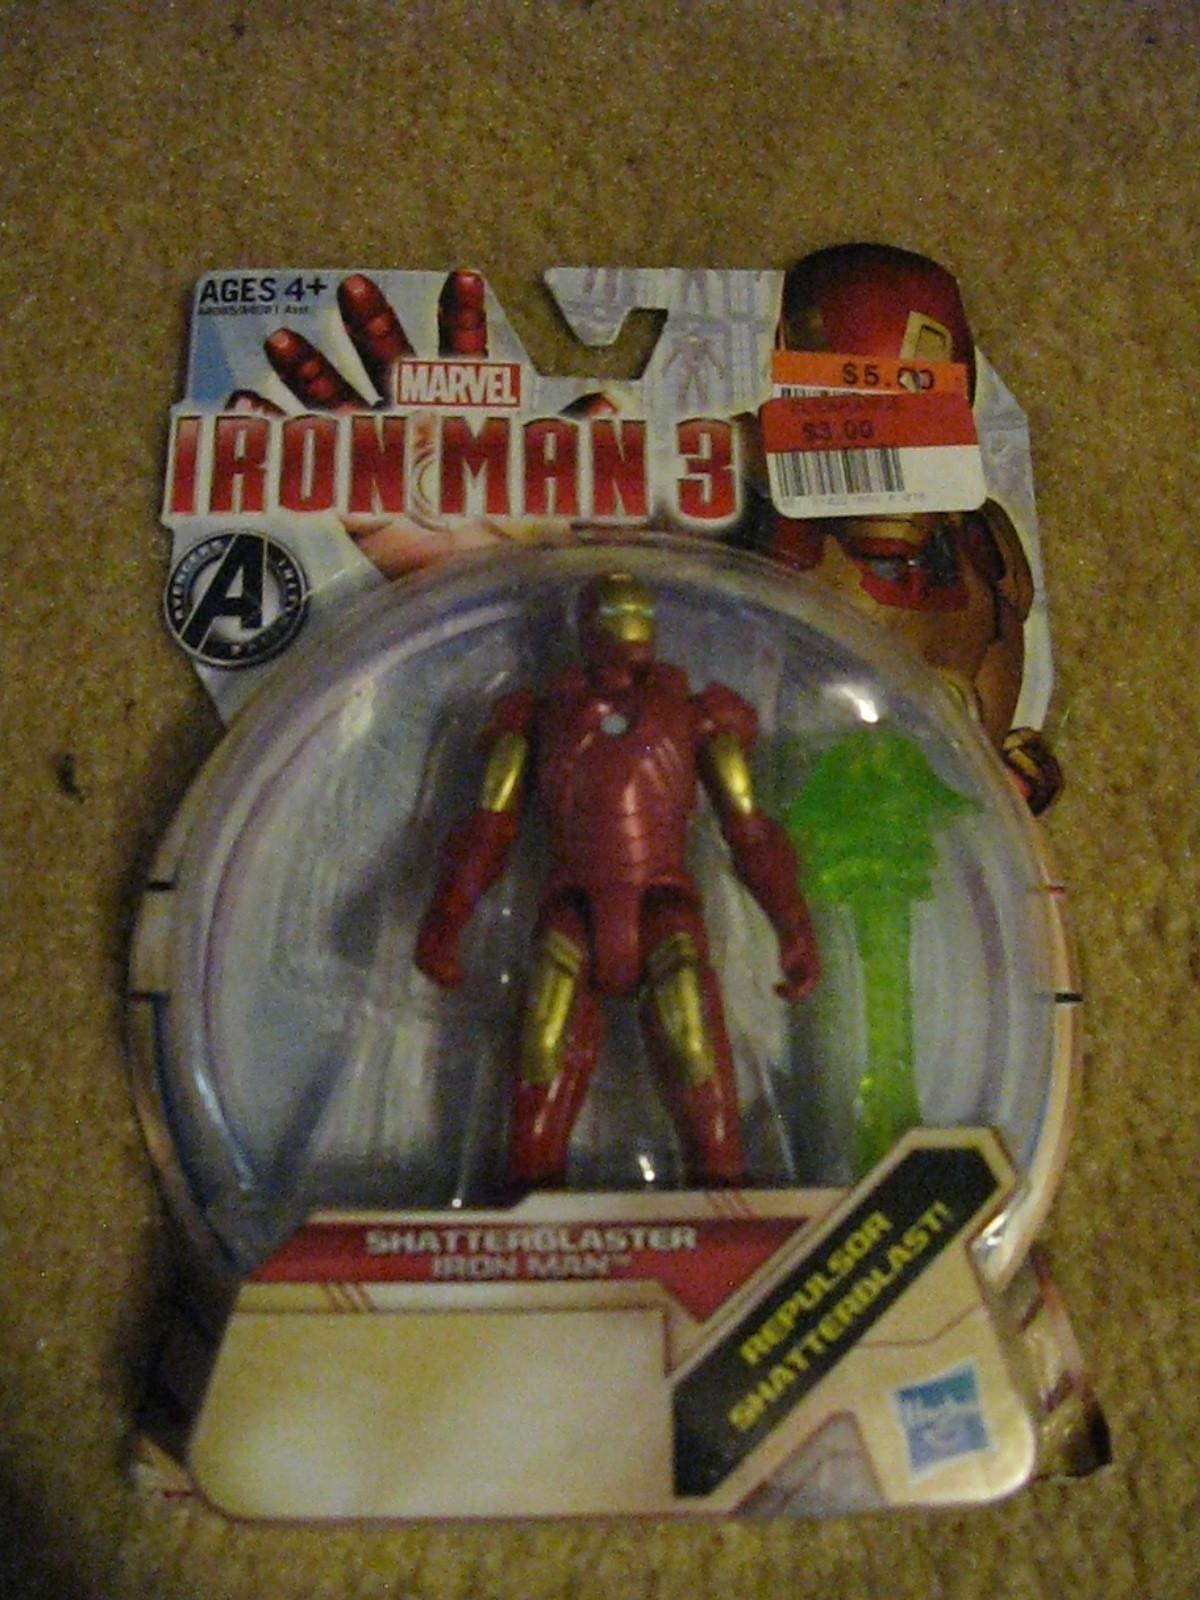 Anime Cartoon Marvel Spider-man Pvc Figure Collectible Toy 7-9cm Kt4149 Toys & Hobbies